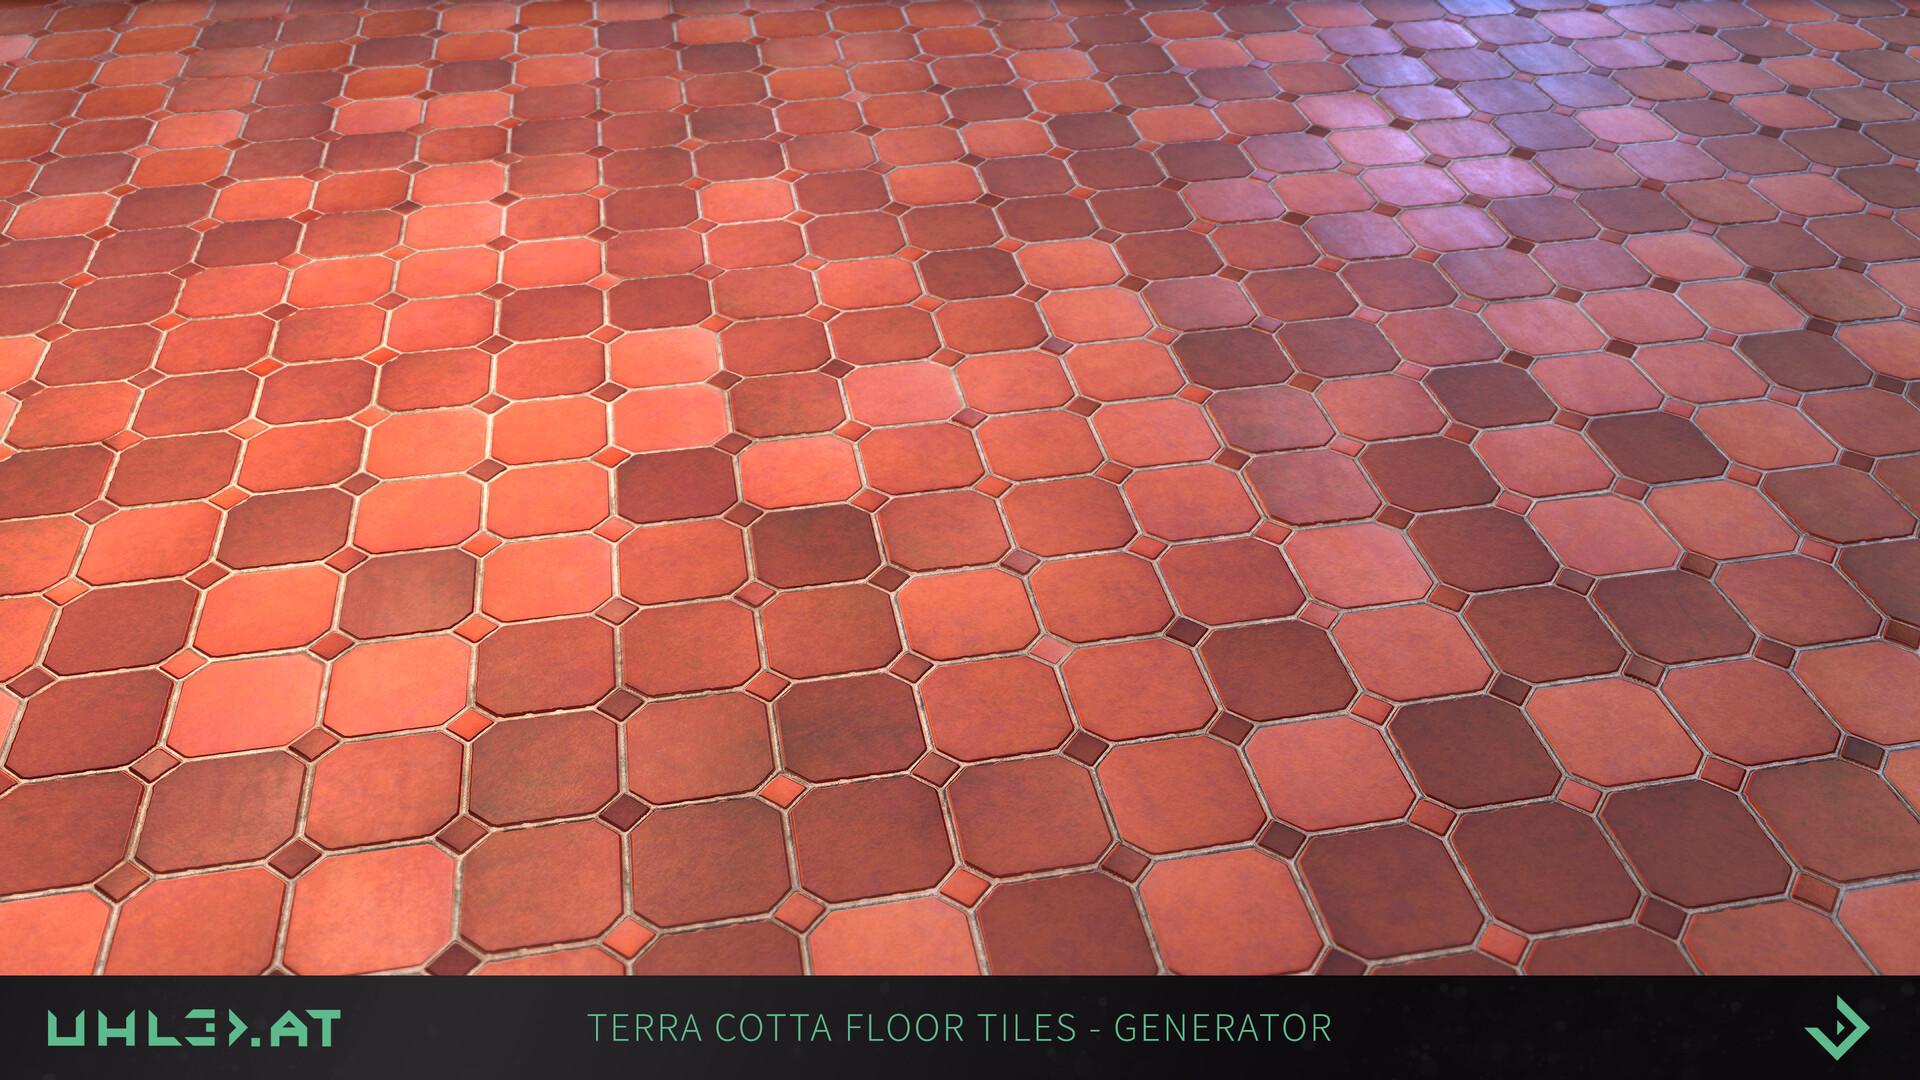 Dominik uhl terracottafloor generator detail 02